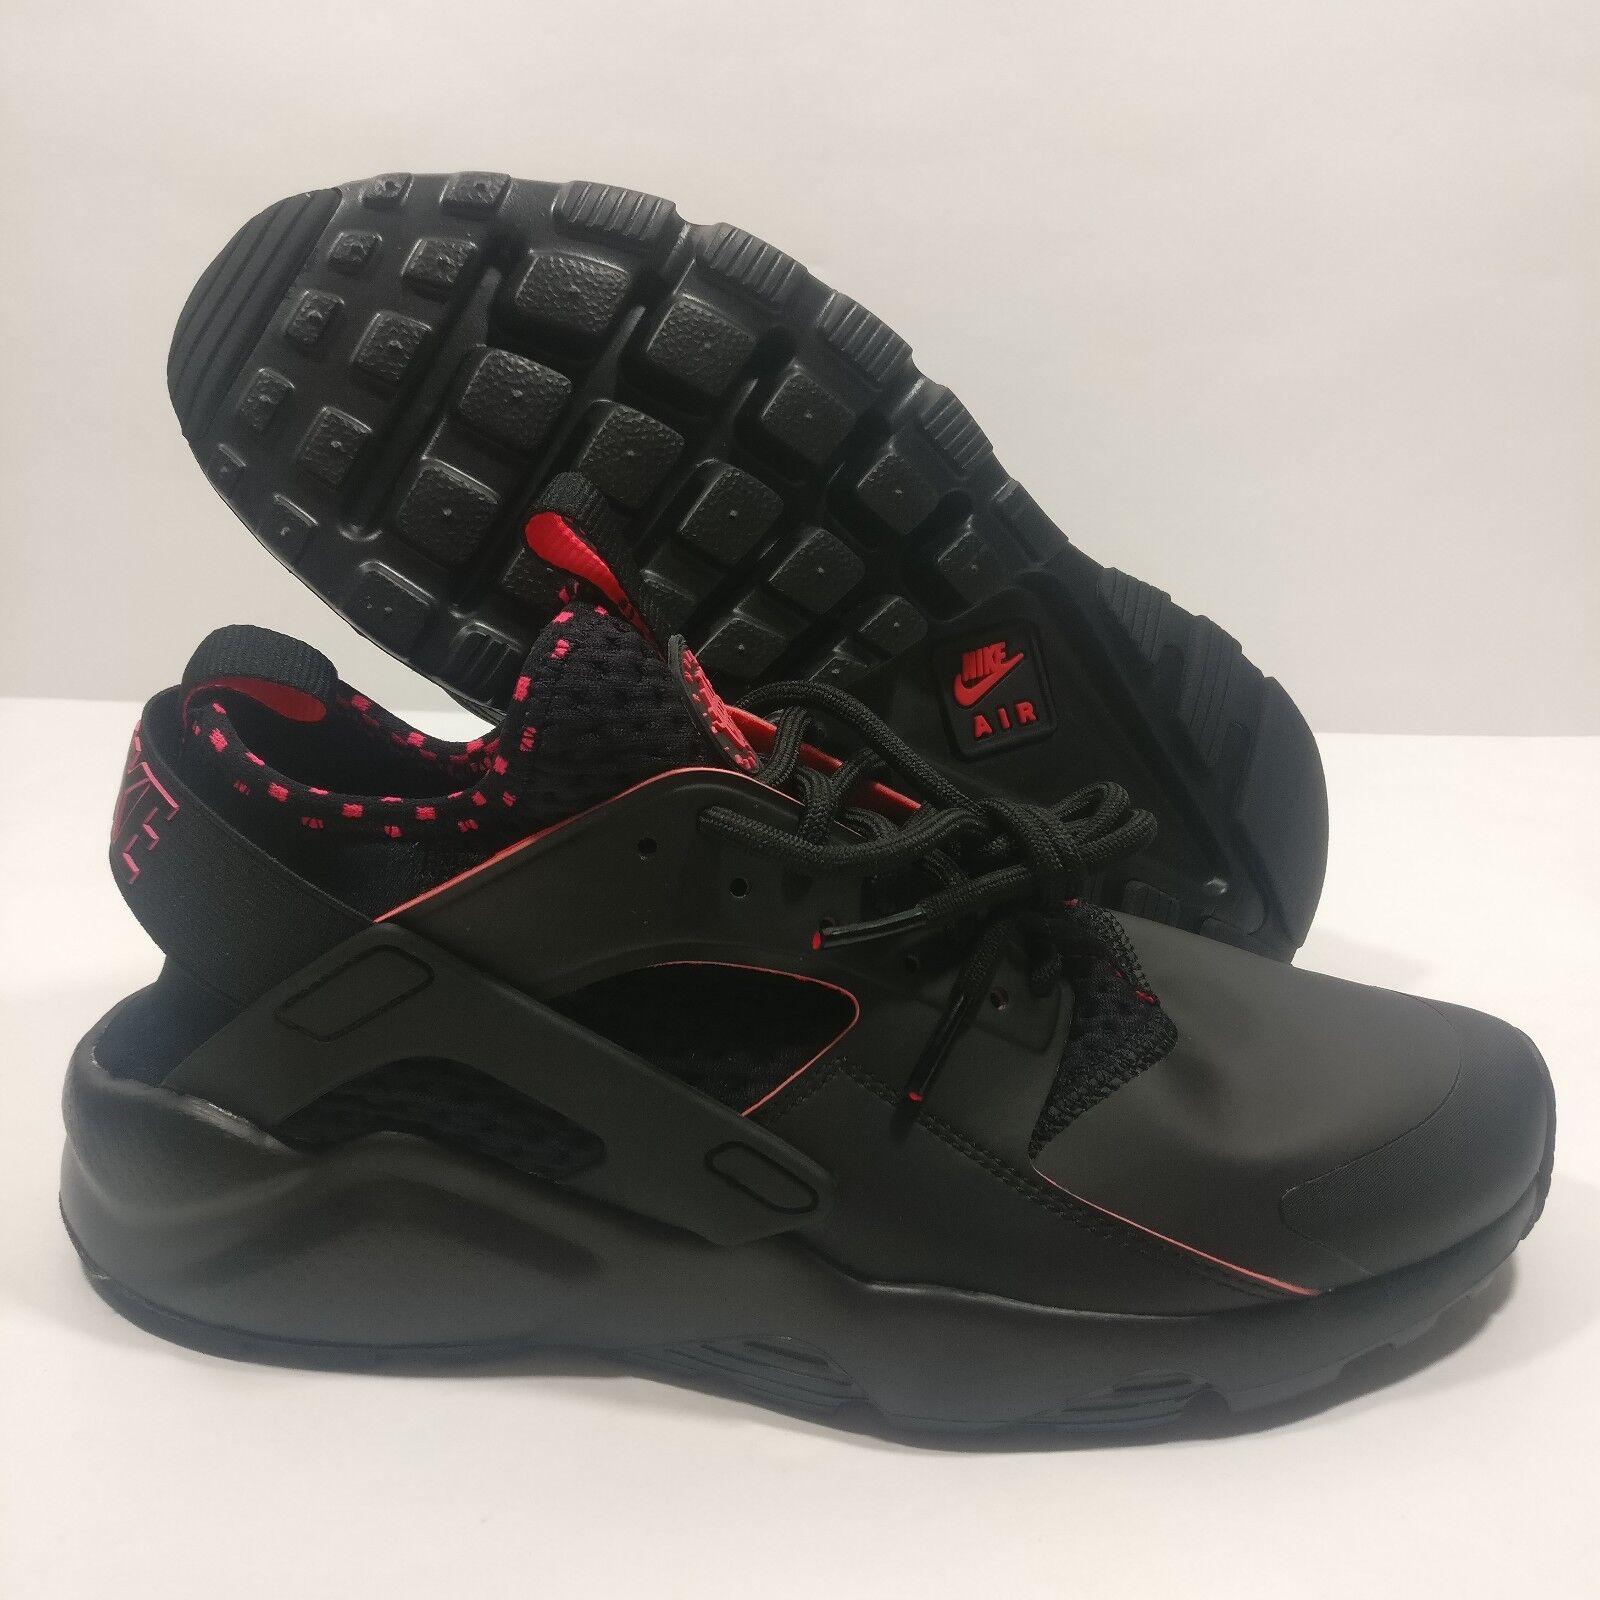 Mens Nike Air Huarache Run Ultra SE shoes Black Red 875841-005 Size 9.5